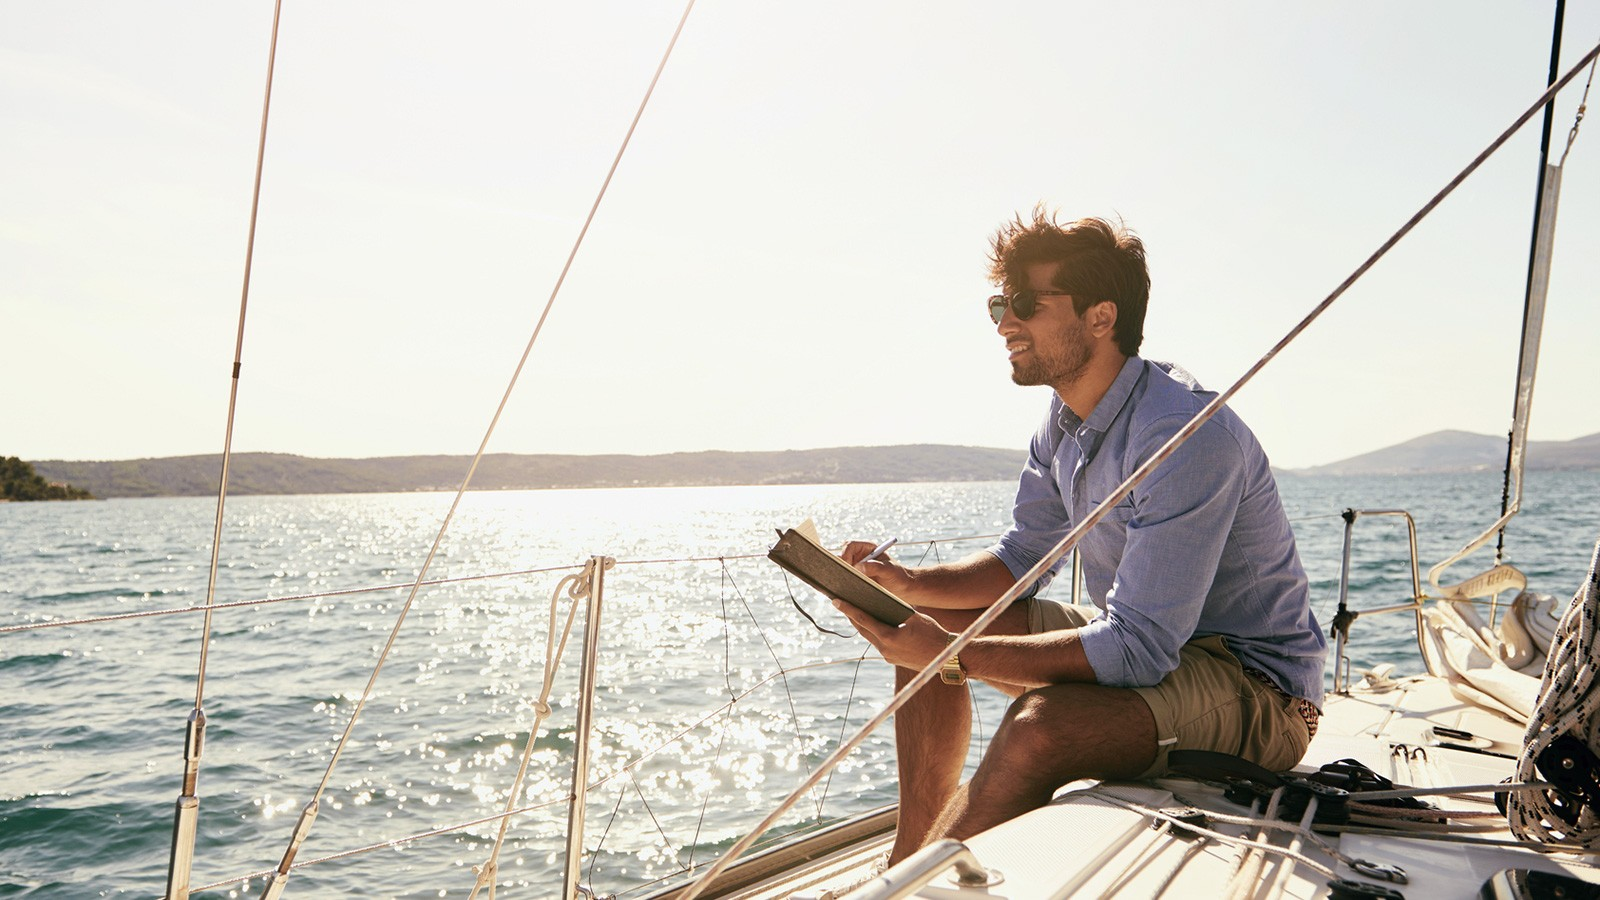 man writing ballad on boat in journal